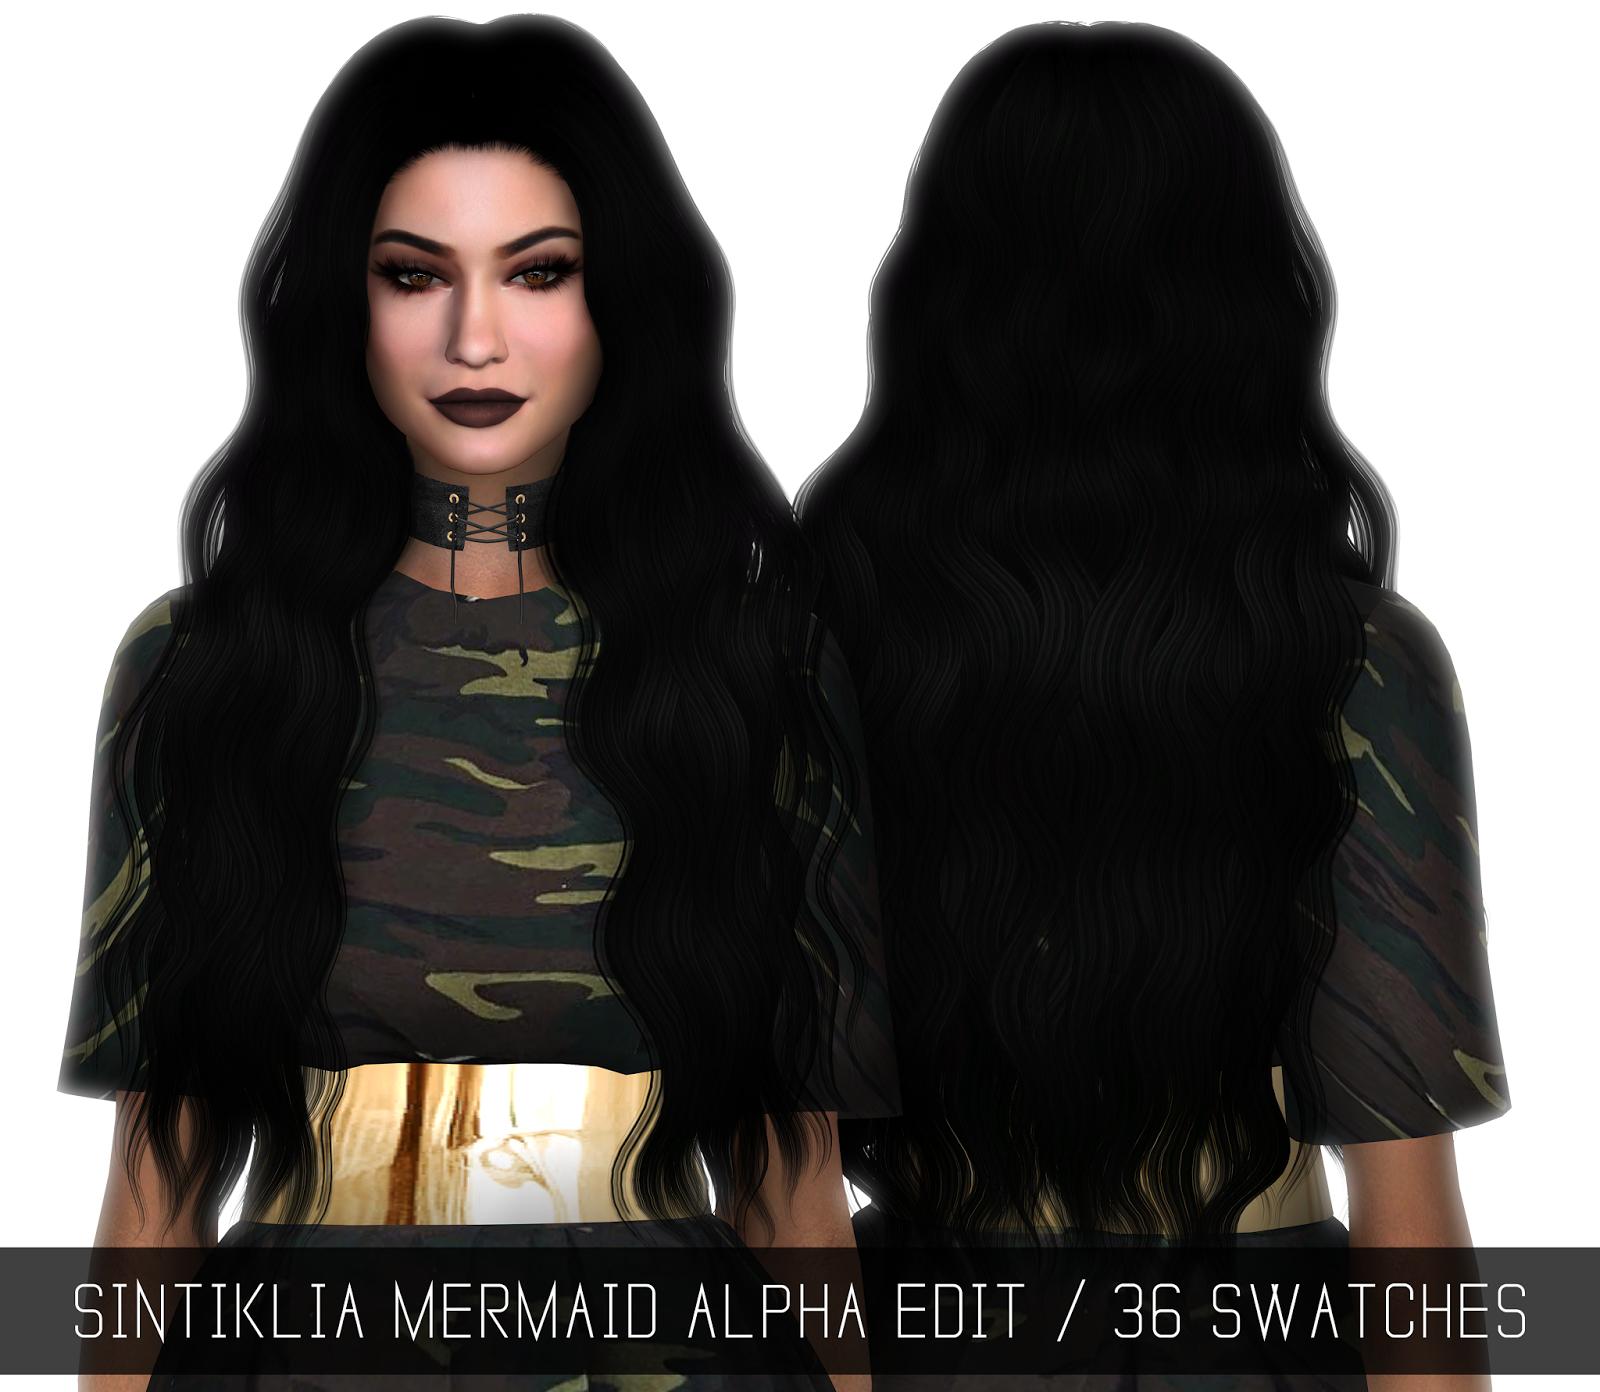 SINTIKLIA MERMAID ALPHA EDIT The Sims 4 Cc Pinterest